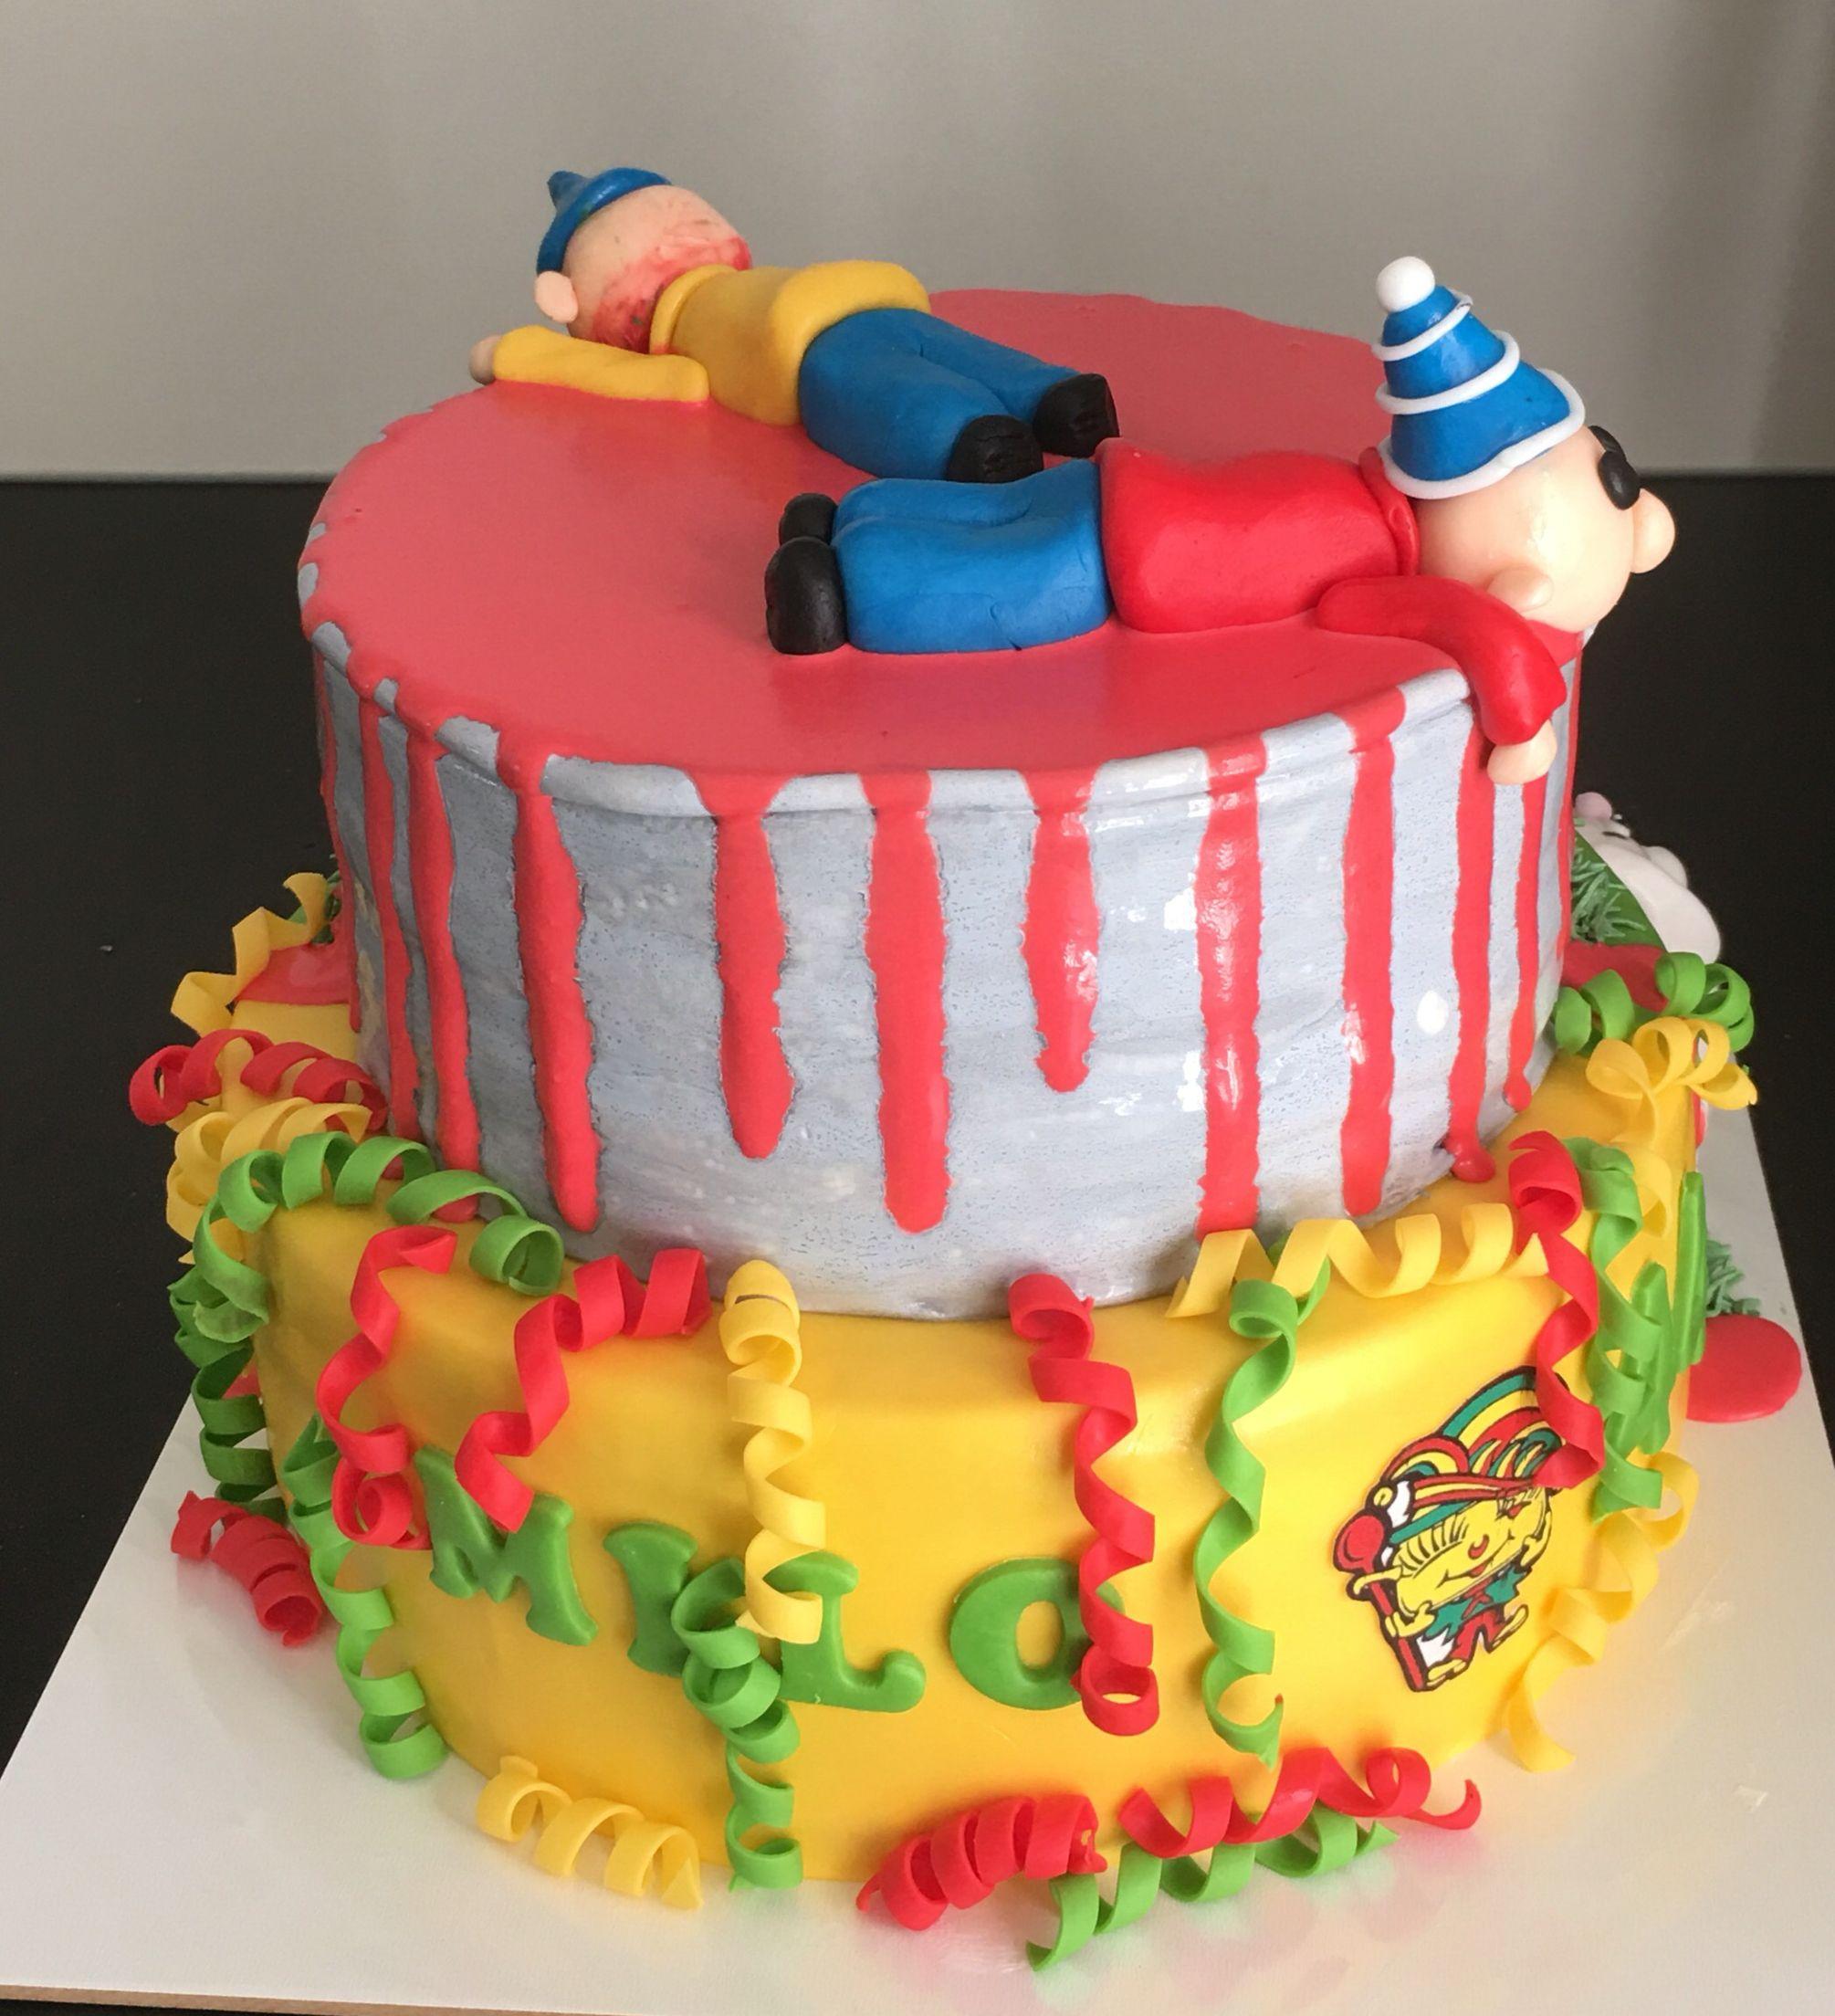 Fantasie taart deel 1, juli 2016